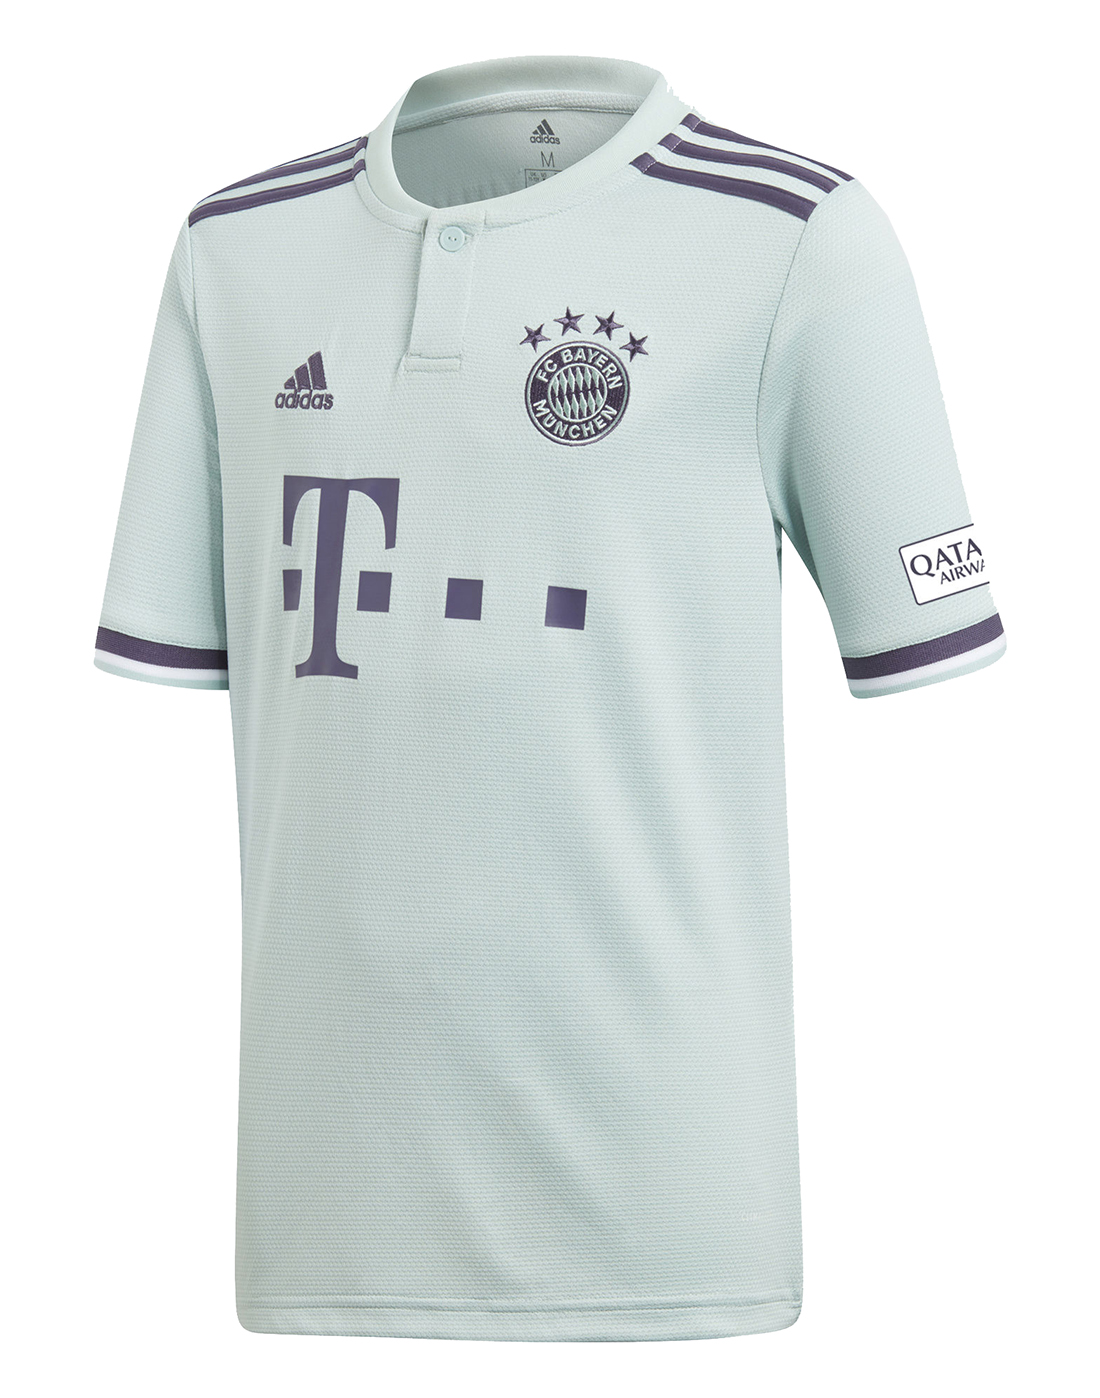 competitive price 859d6 a500f Kids FC Bayern Munich 18/19 Away Jersey